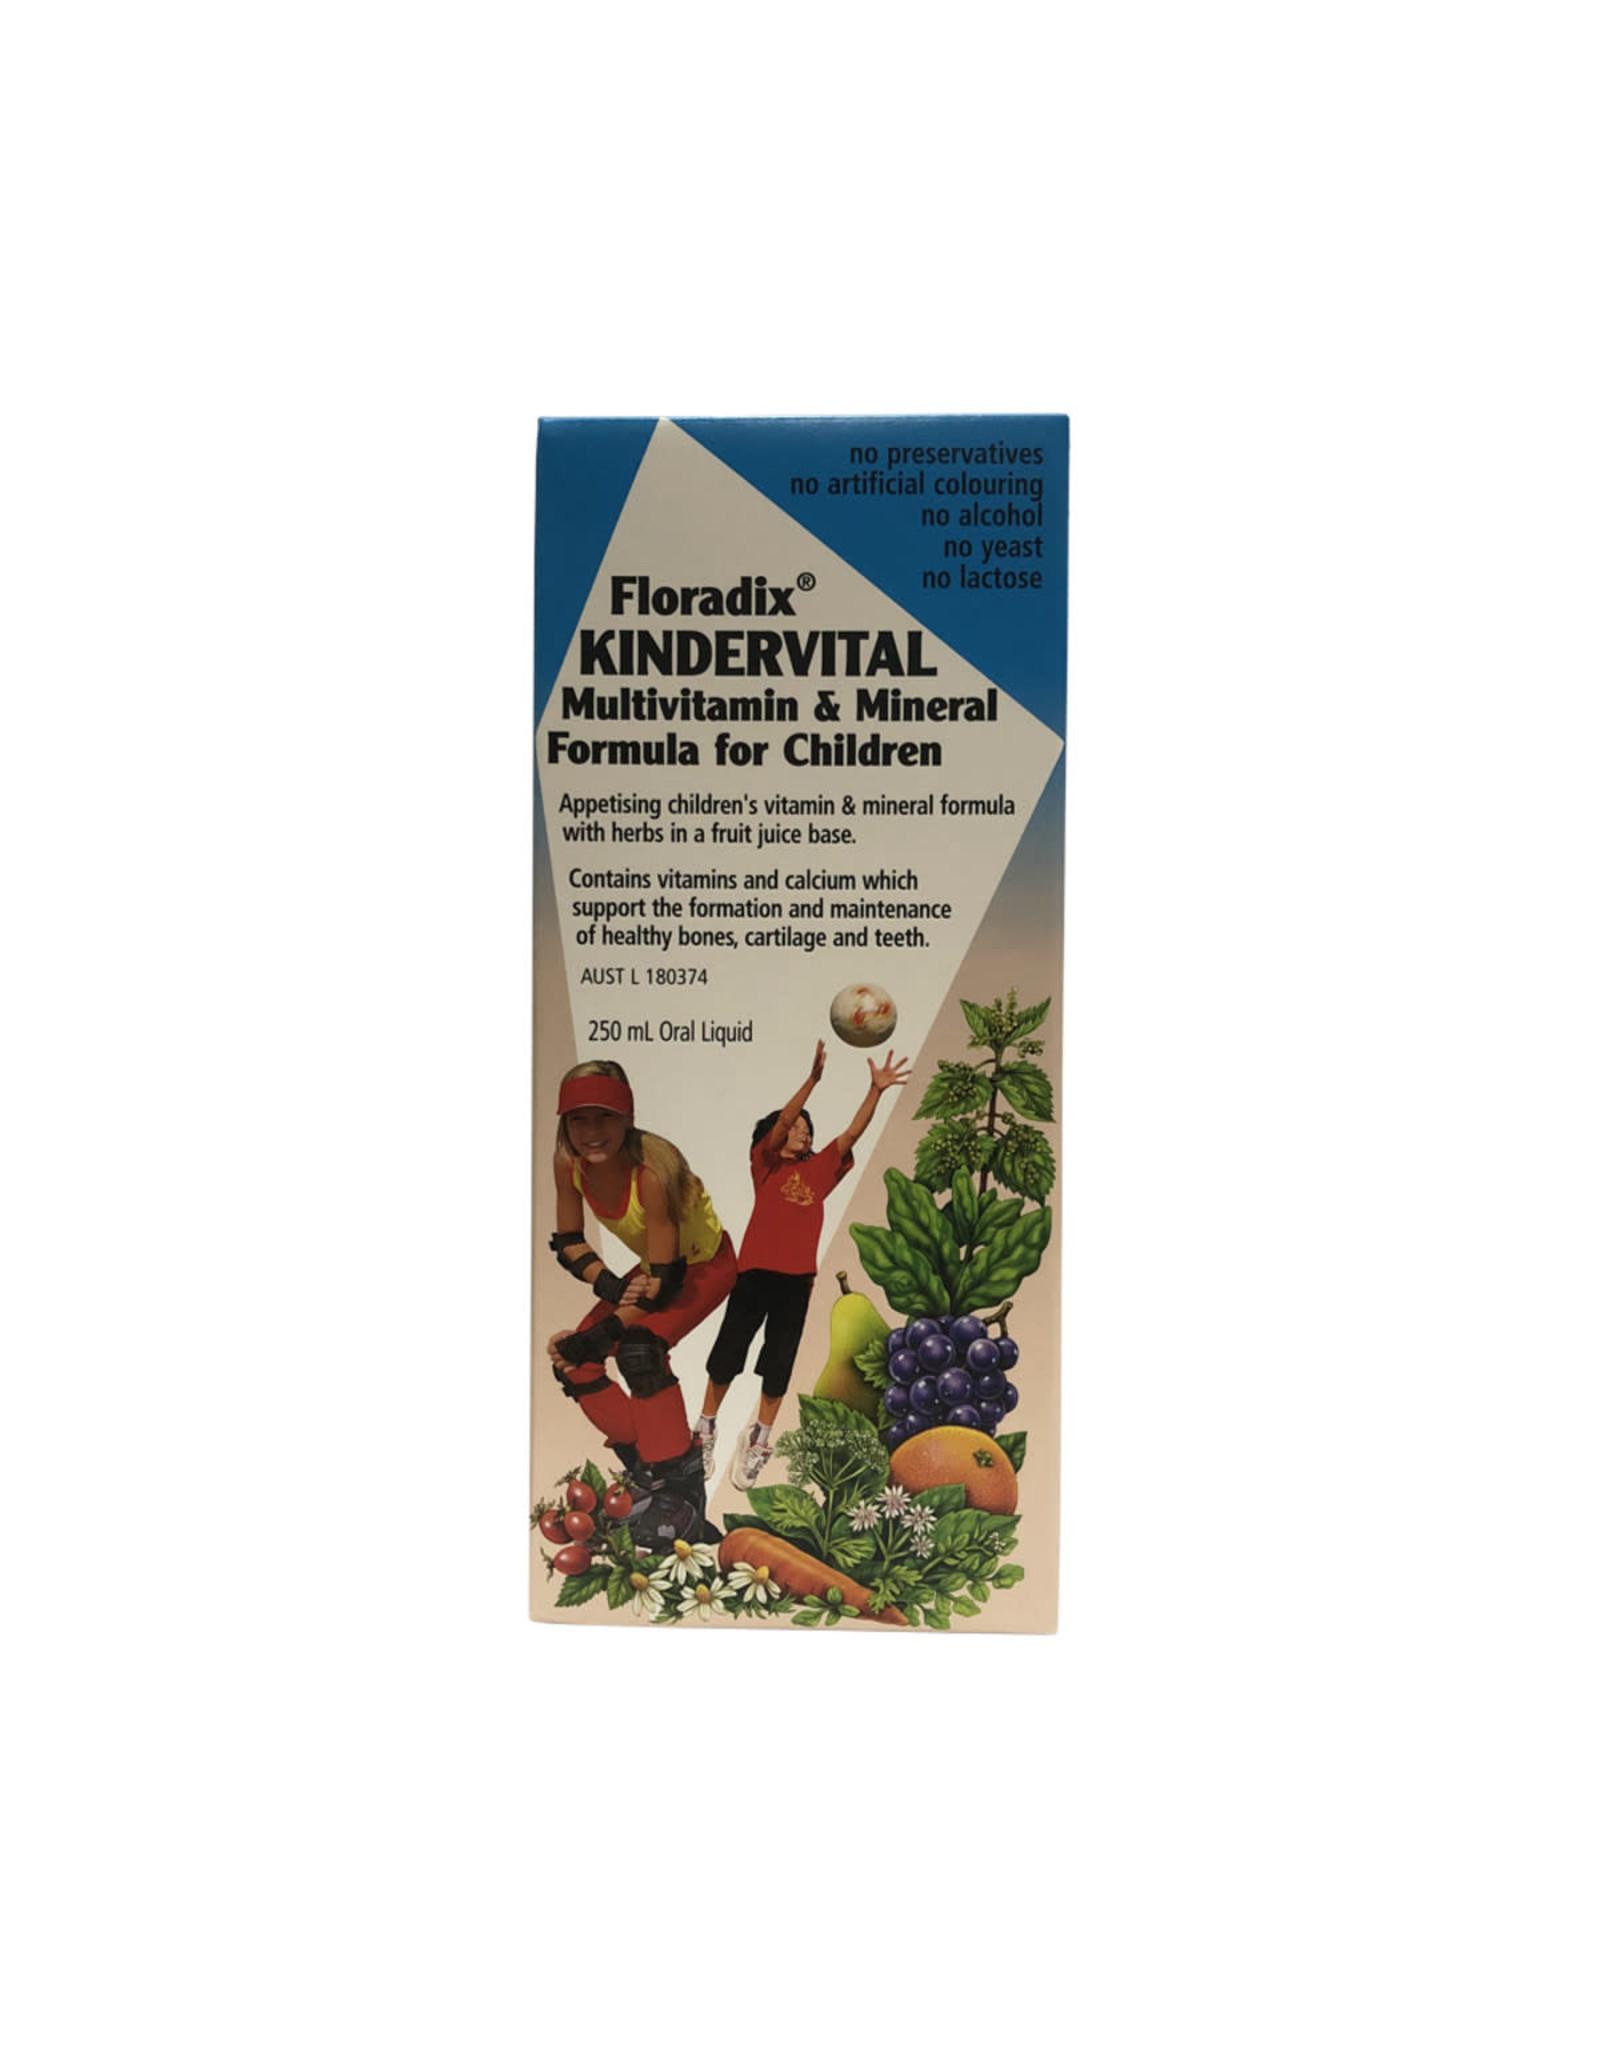 Floradix Kindervital Multivitamin for Children 250ml